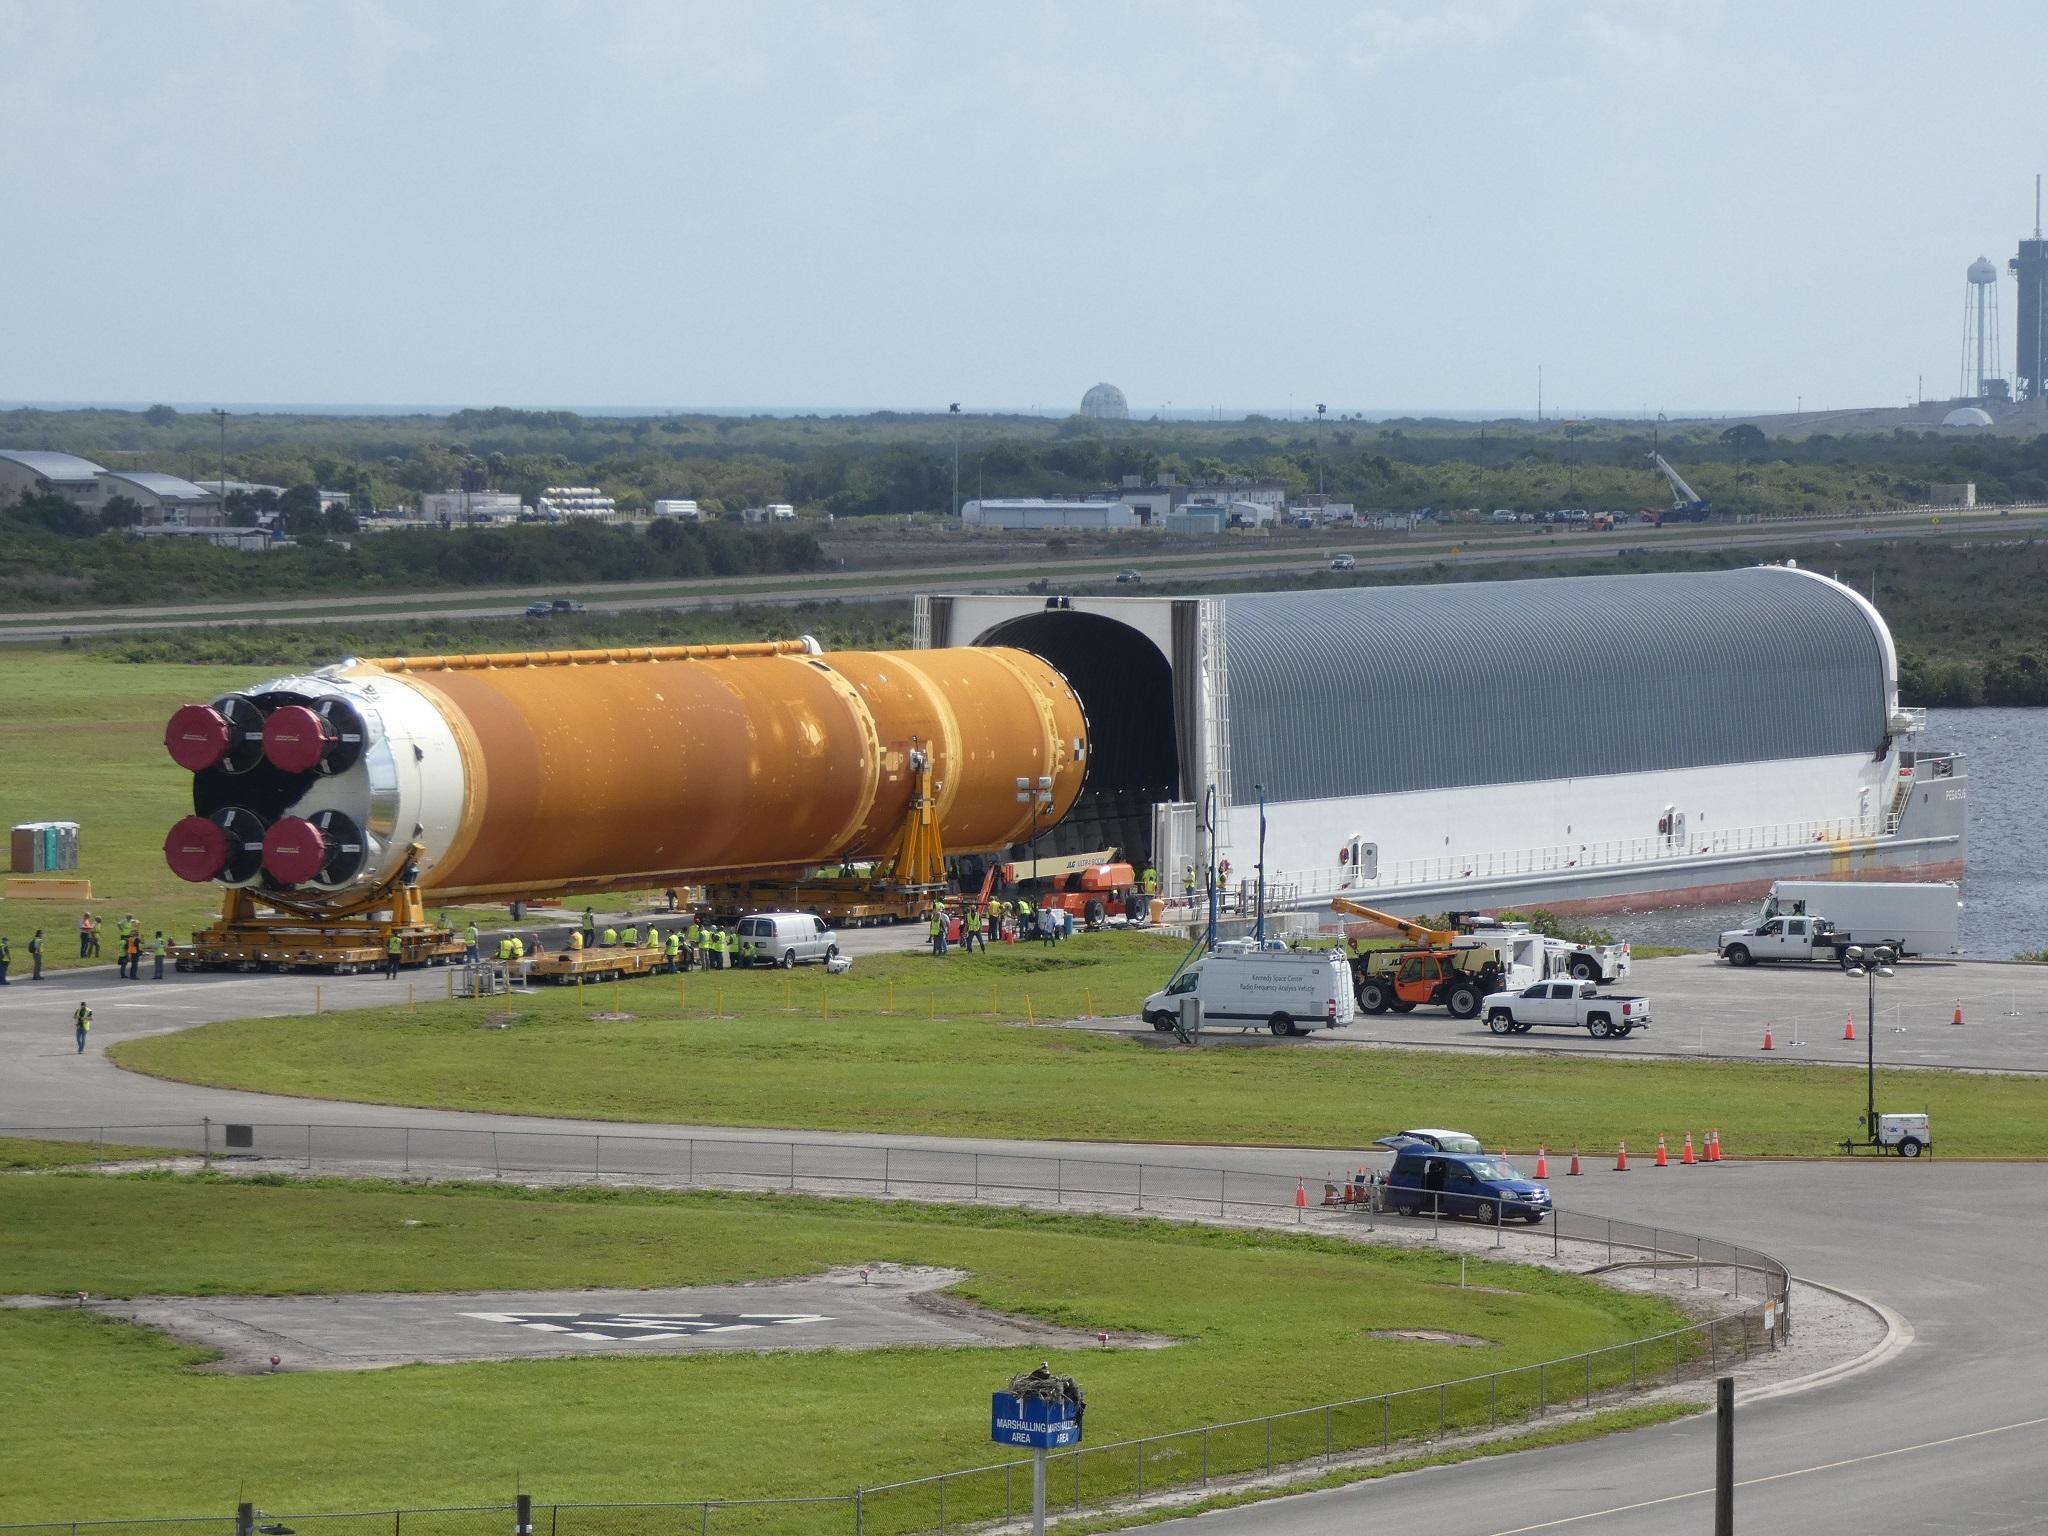 NASA EGS, Jacobs preparing SLS Core Stage for Artemis 1 stacking - NASASpaceFlight.com - NASASpaceflight.com